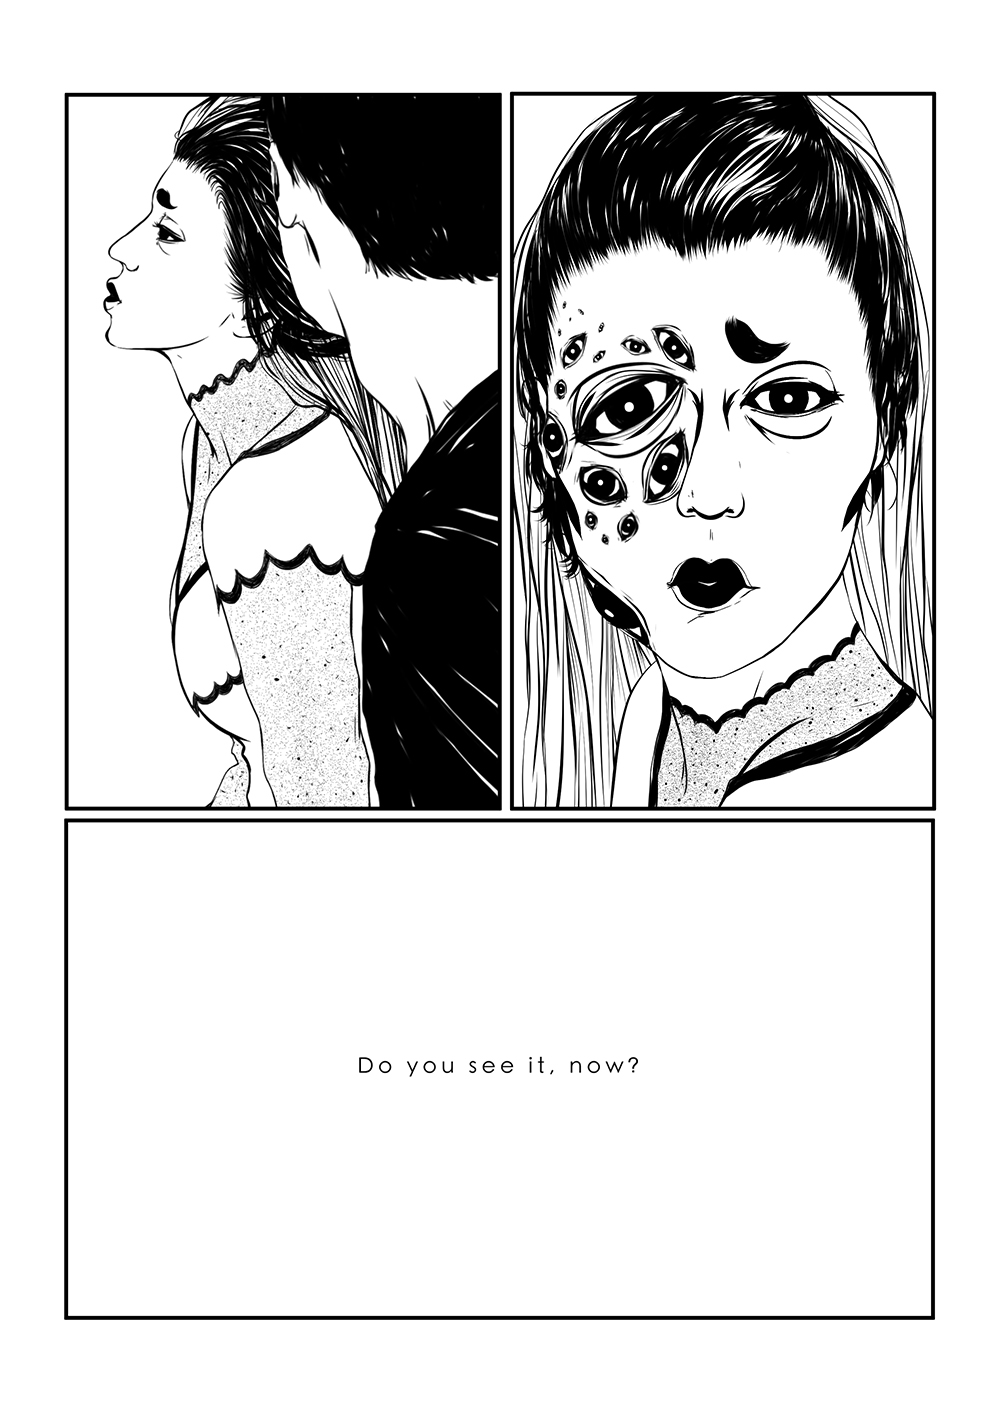 mojowang_illustration_betweenrivers_21_12.jpg